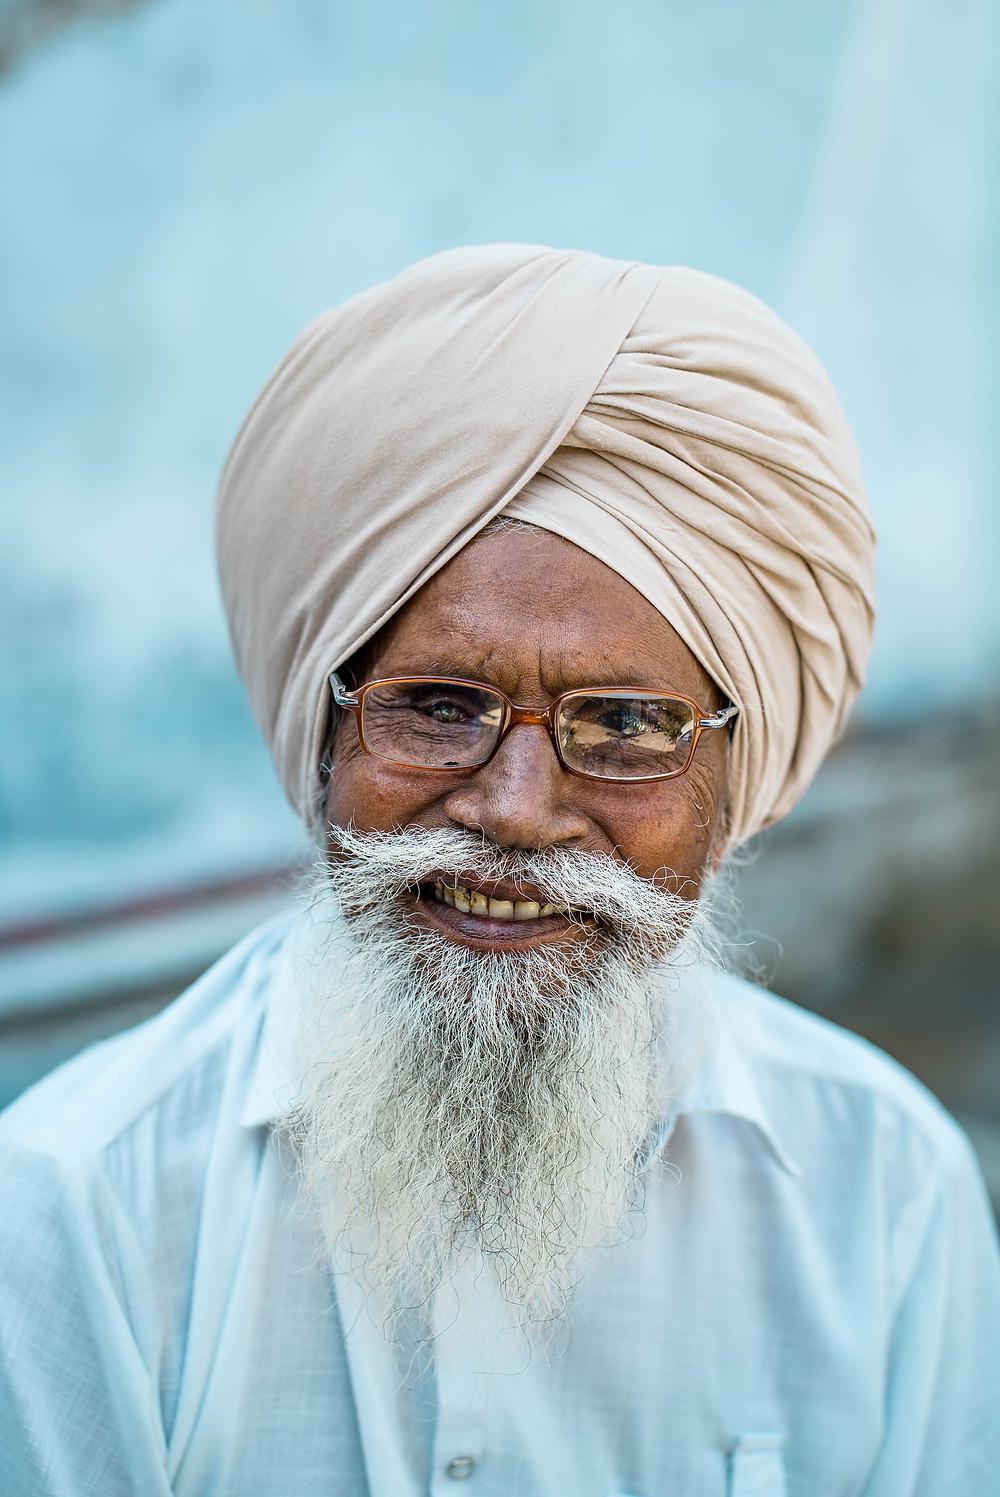 Source: Unsplash(Man wearing a turban)